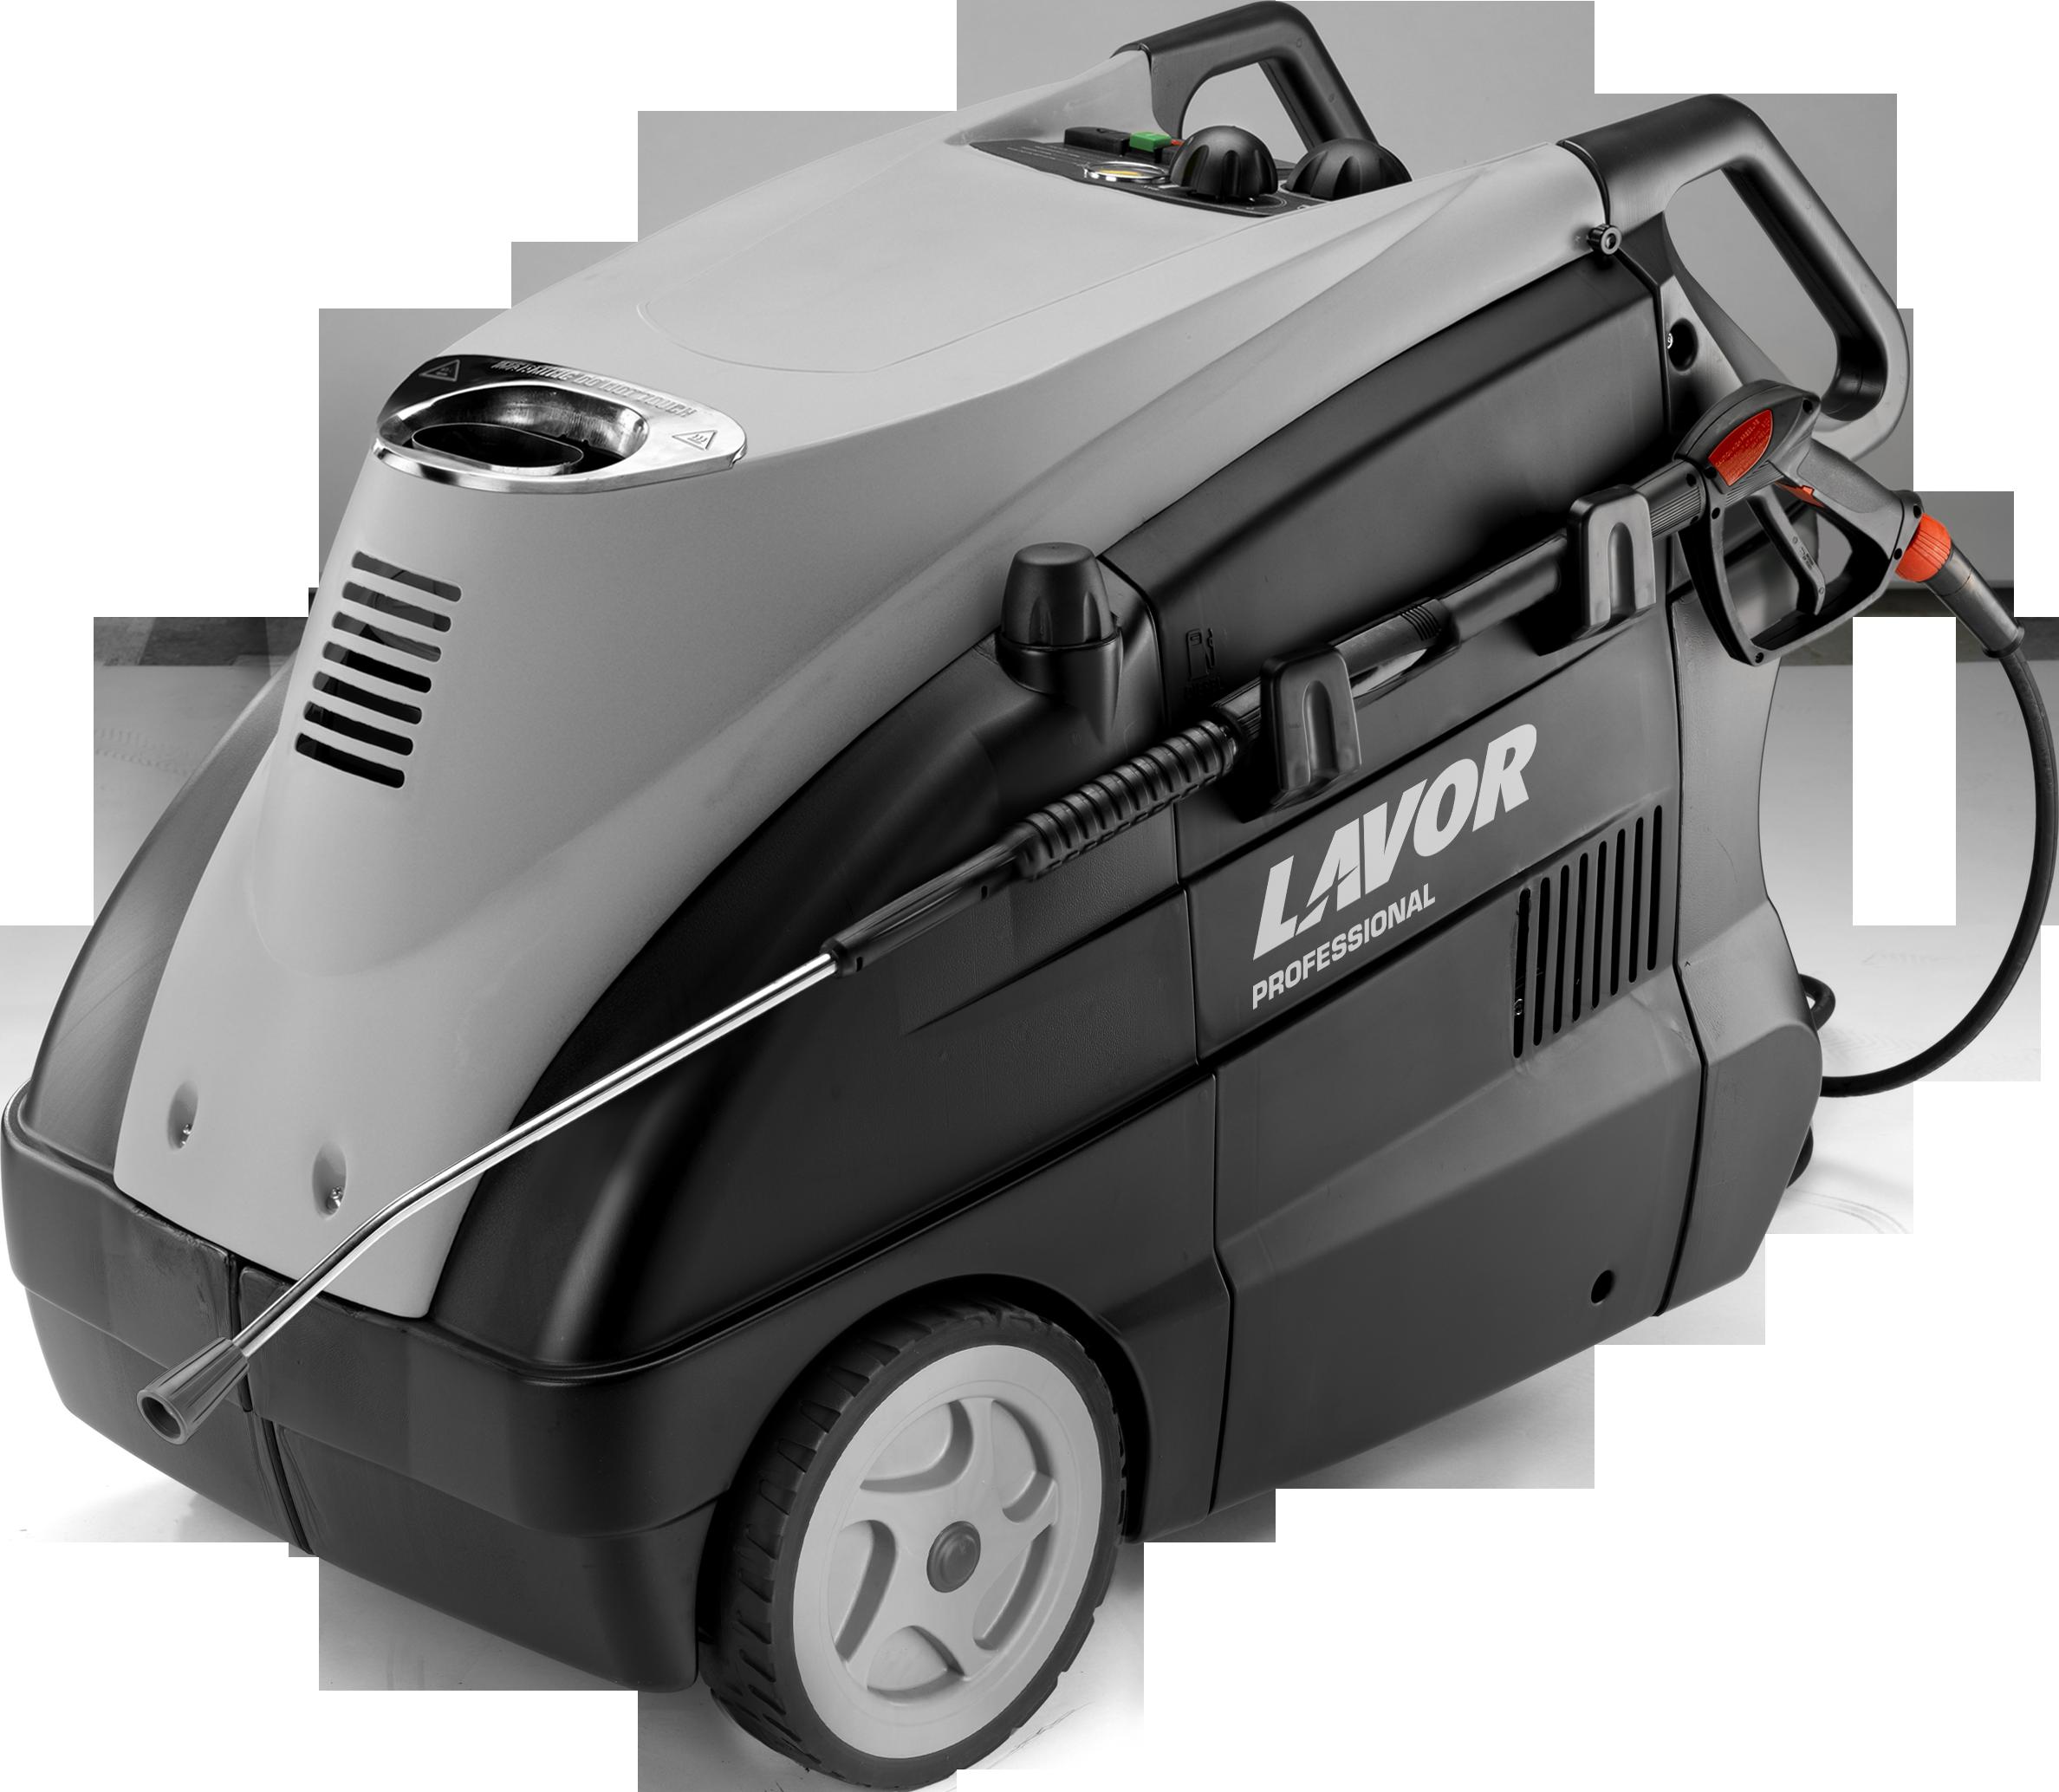 IDROPULITRICE ACQUA CALDA LAVOR TEKNA 2015 LP 400V - 200 bar 15 litri/minuto